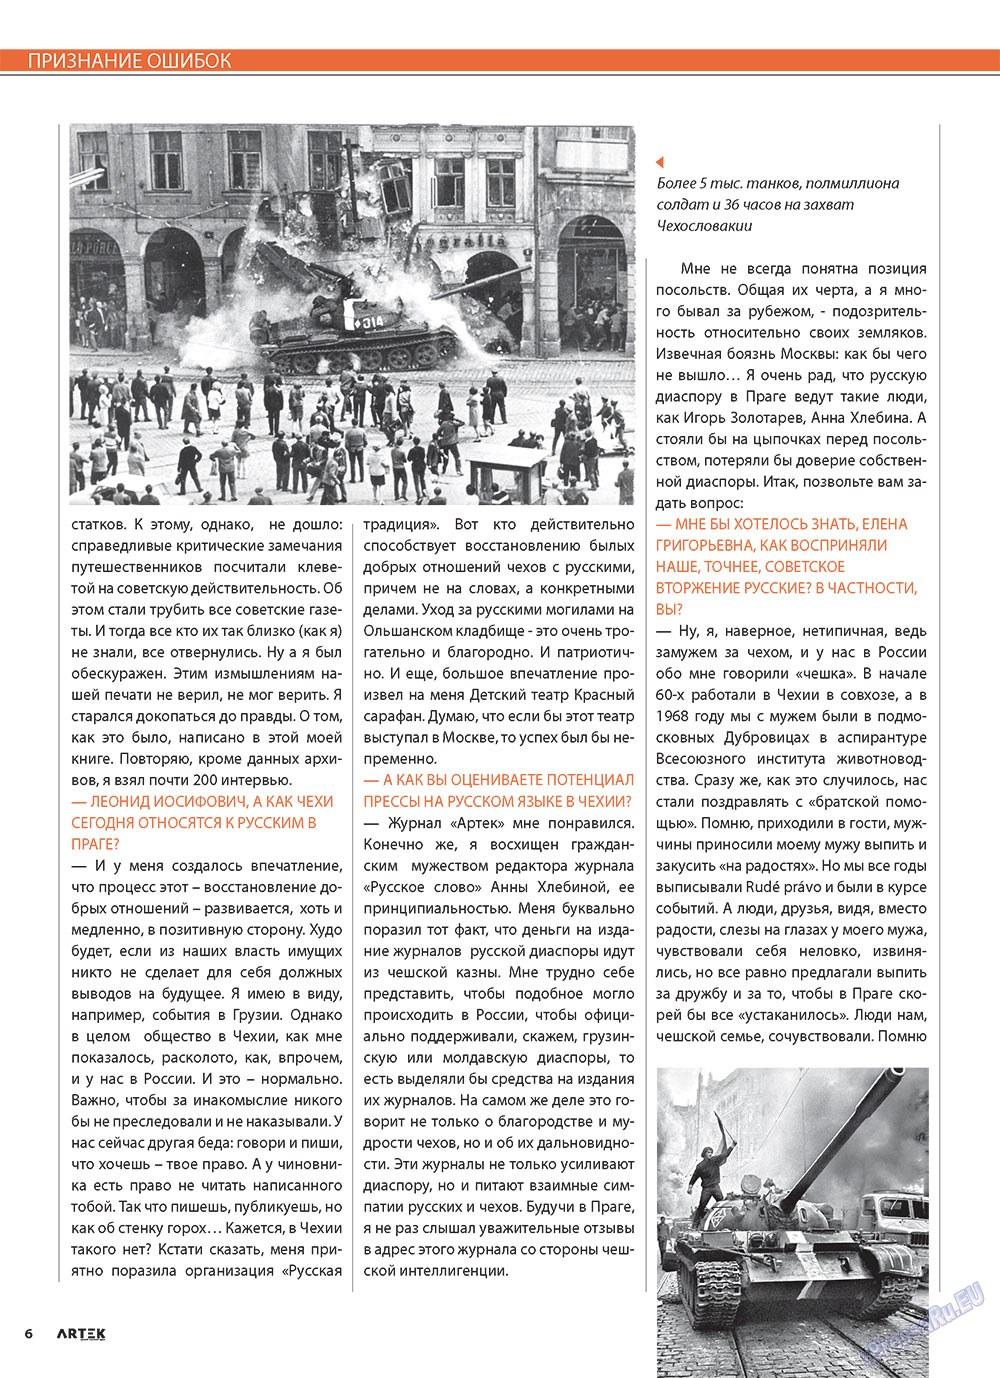 Артек (журнал). 2010 год, номер 4, стр. 8